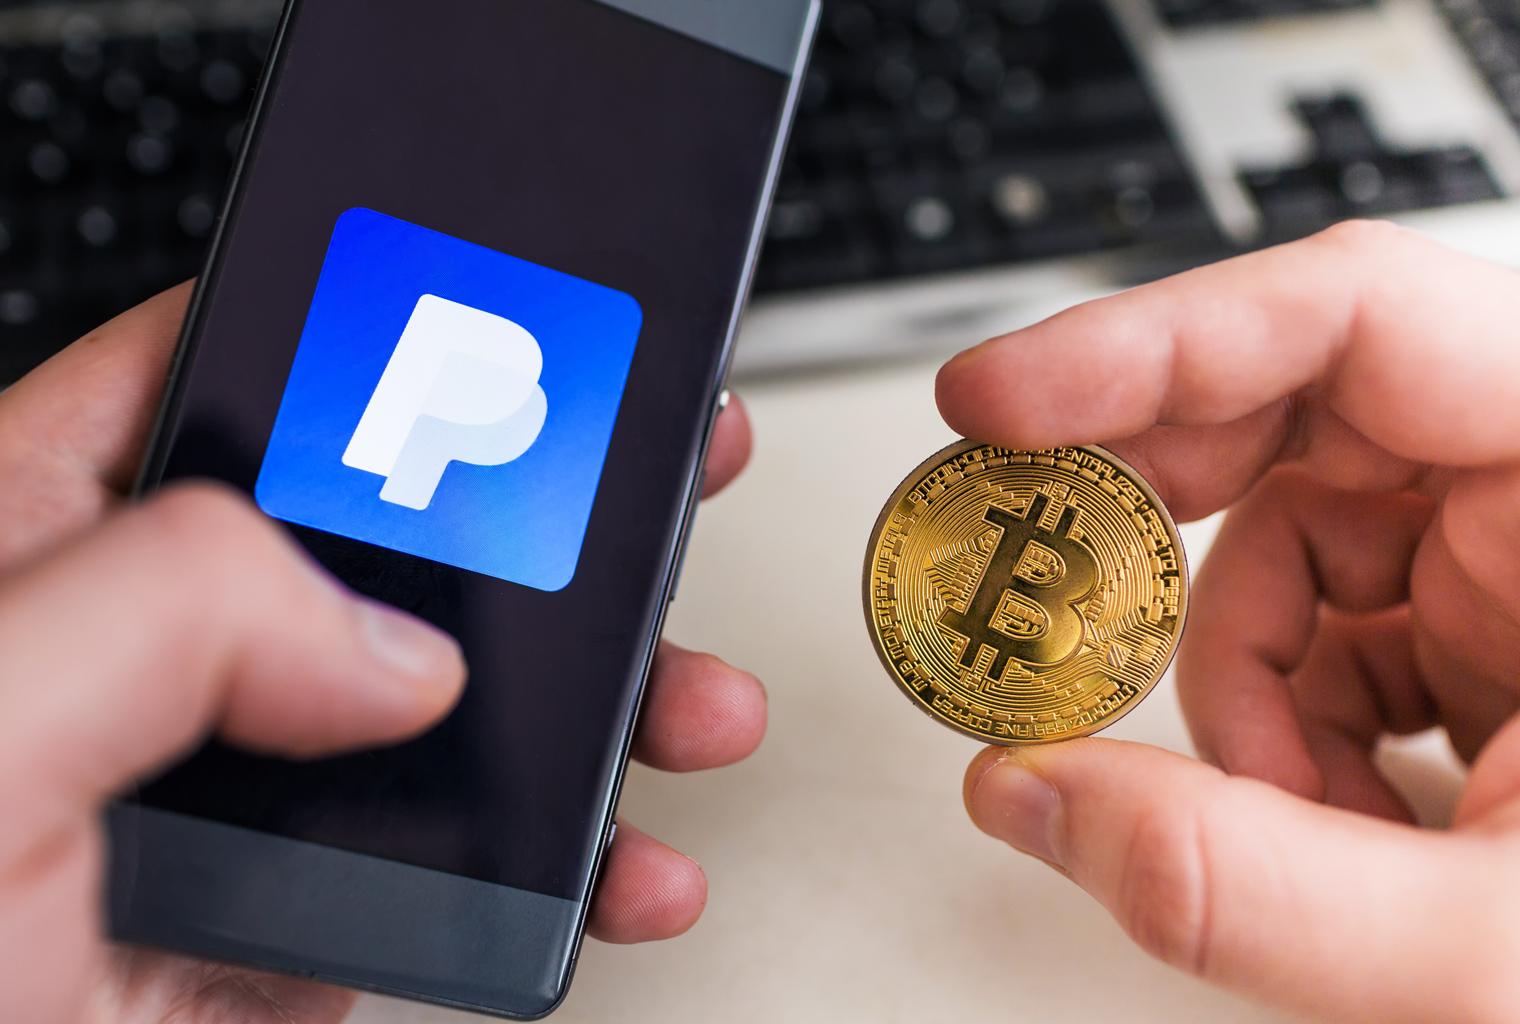 como comprar bitcoins com paypal